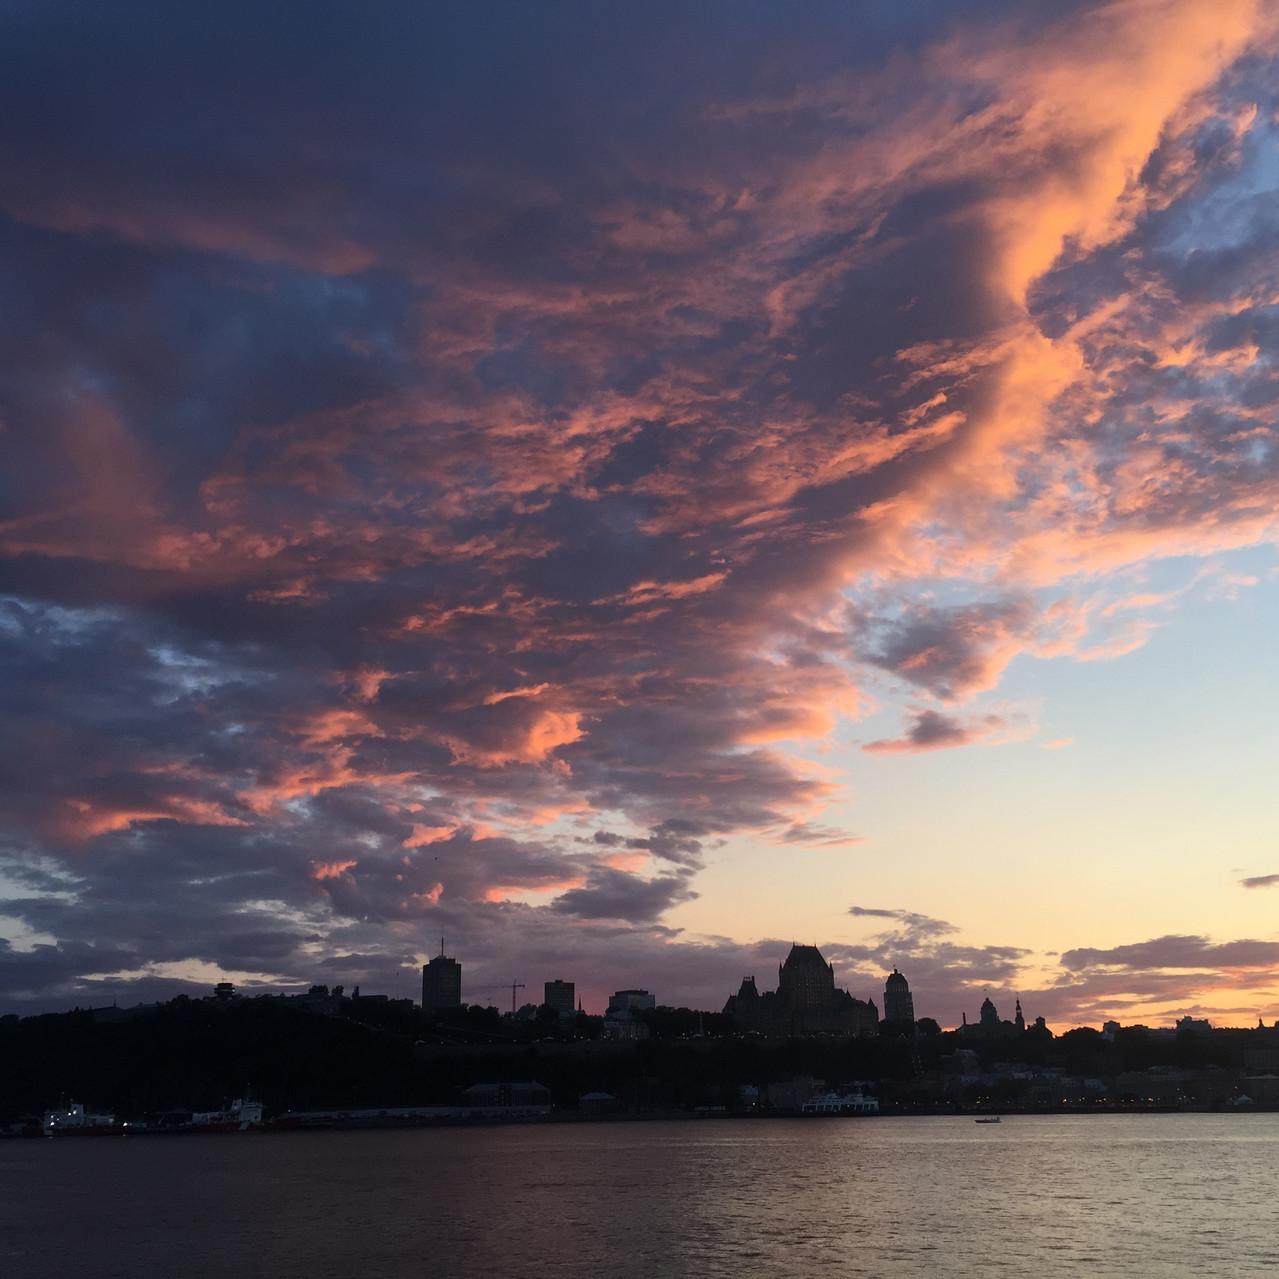 Clouds over Quebec